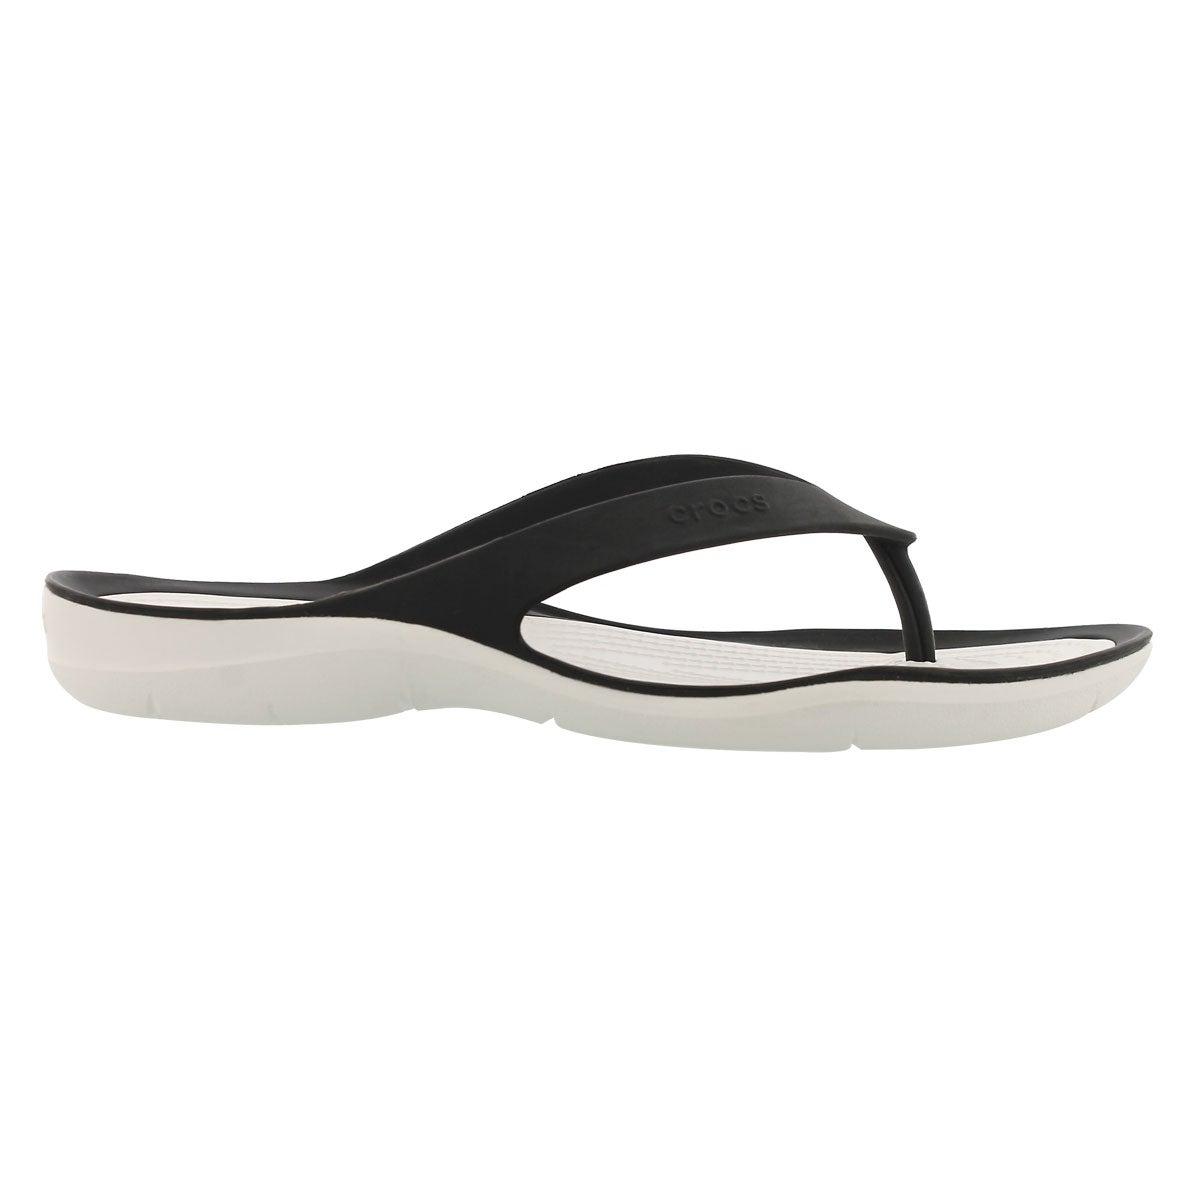 Sandales tong SWIFTWATER FLIP, noir/blanc, femmes